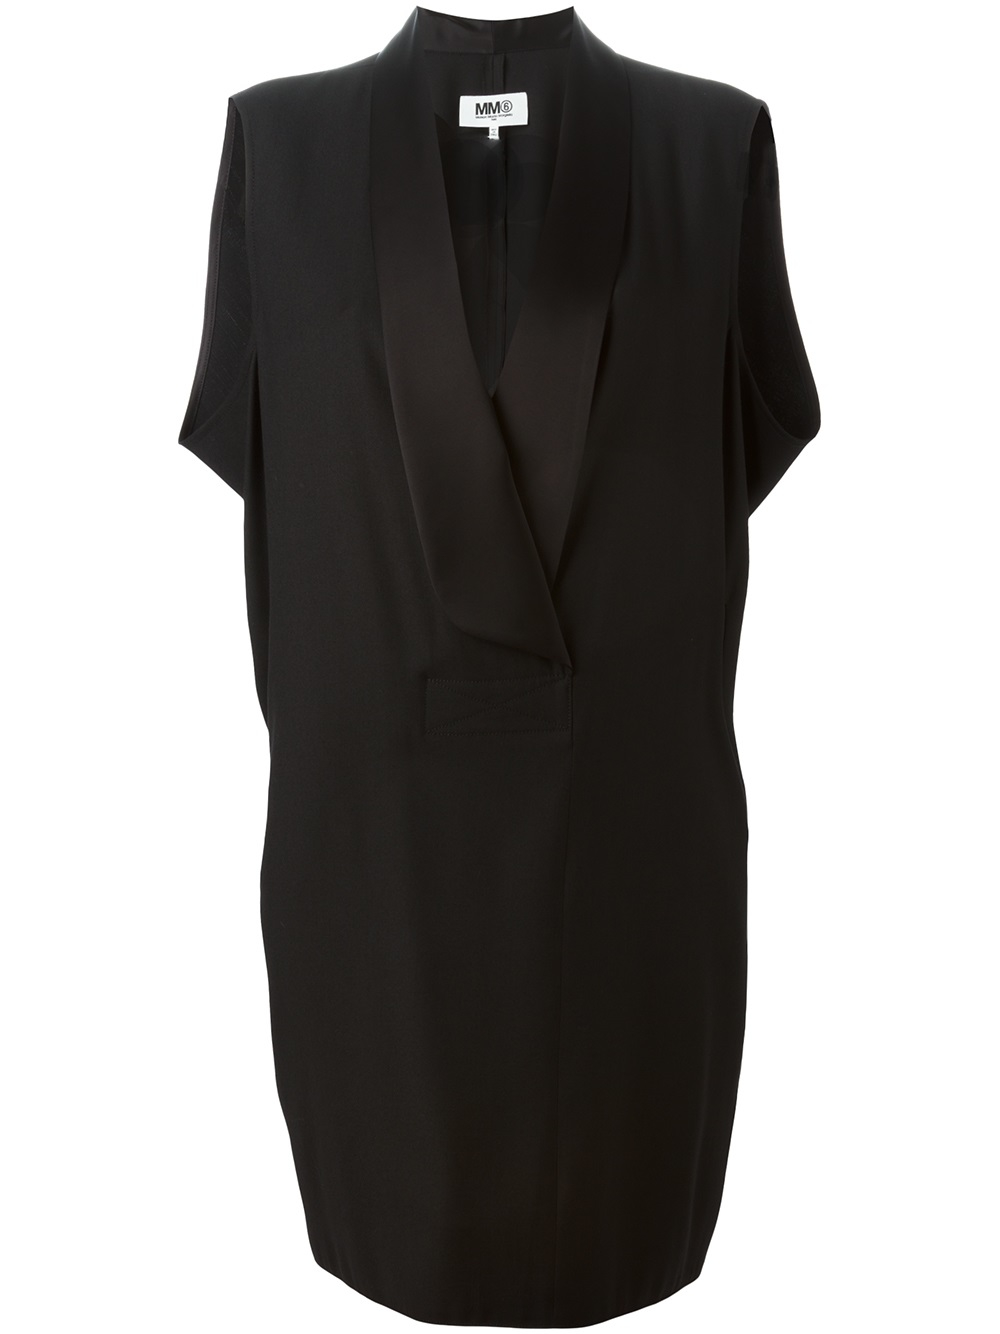 Womens Twill Tuxedo Shift Dress Maison Martin Margiela ausQ7Elx